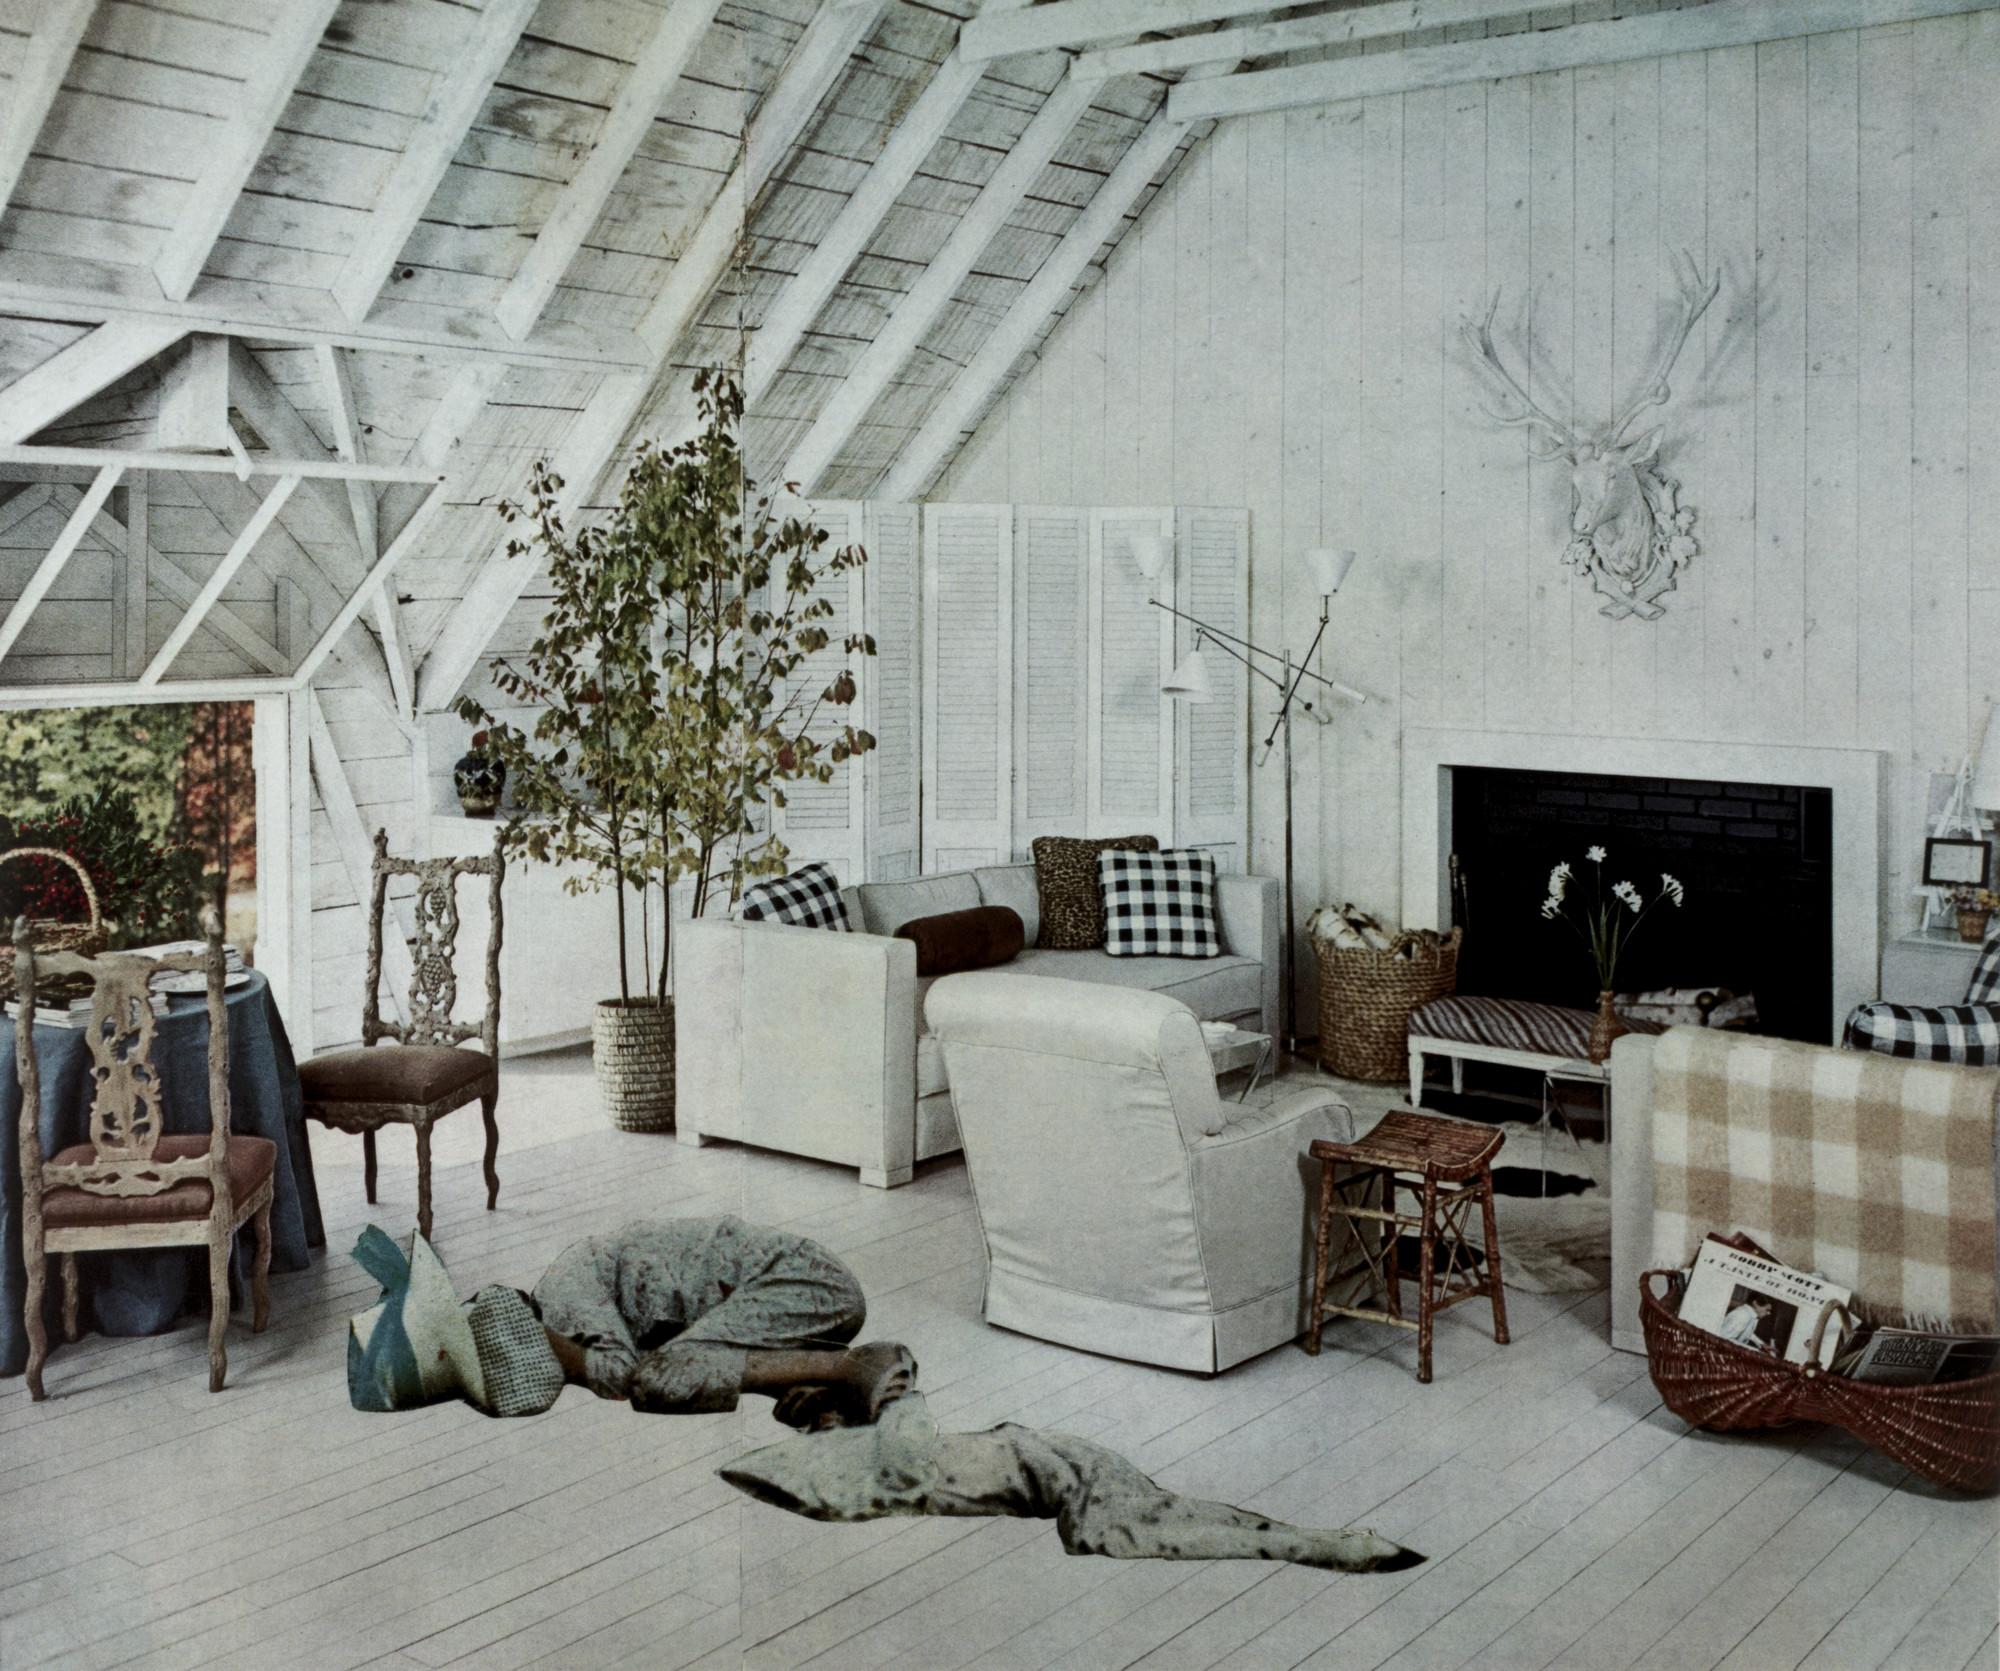 Martha Rosler. Roadside Ambush from the series House Beautiful: Bringing  the War Home. c. 1967-72 | MoMA